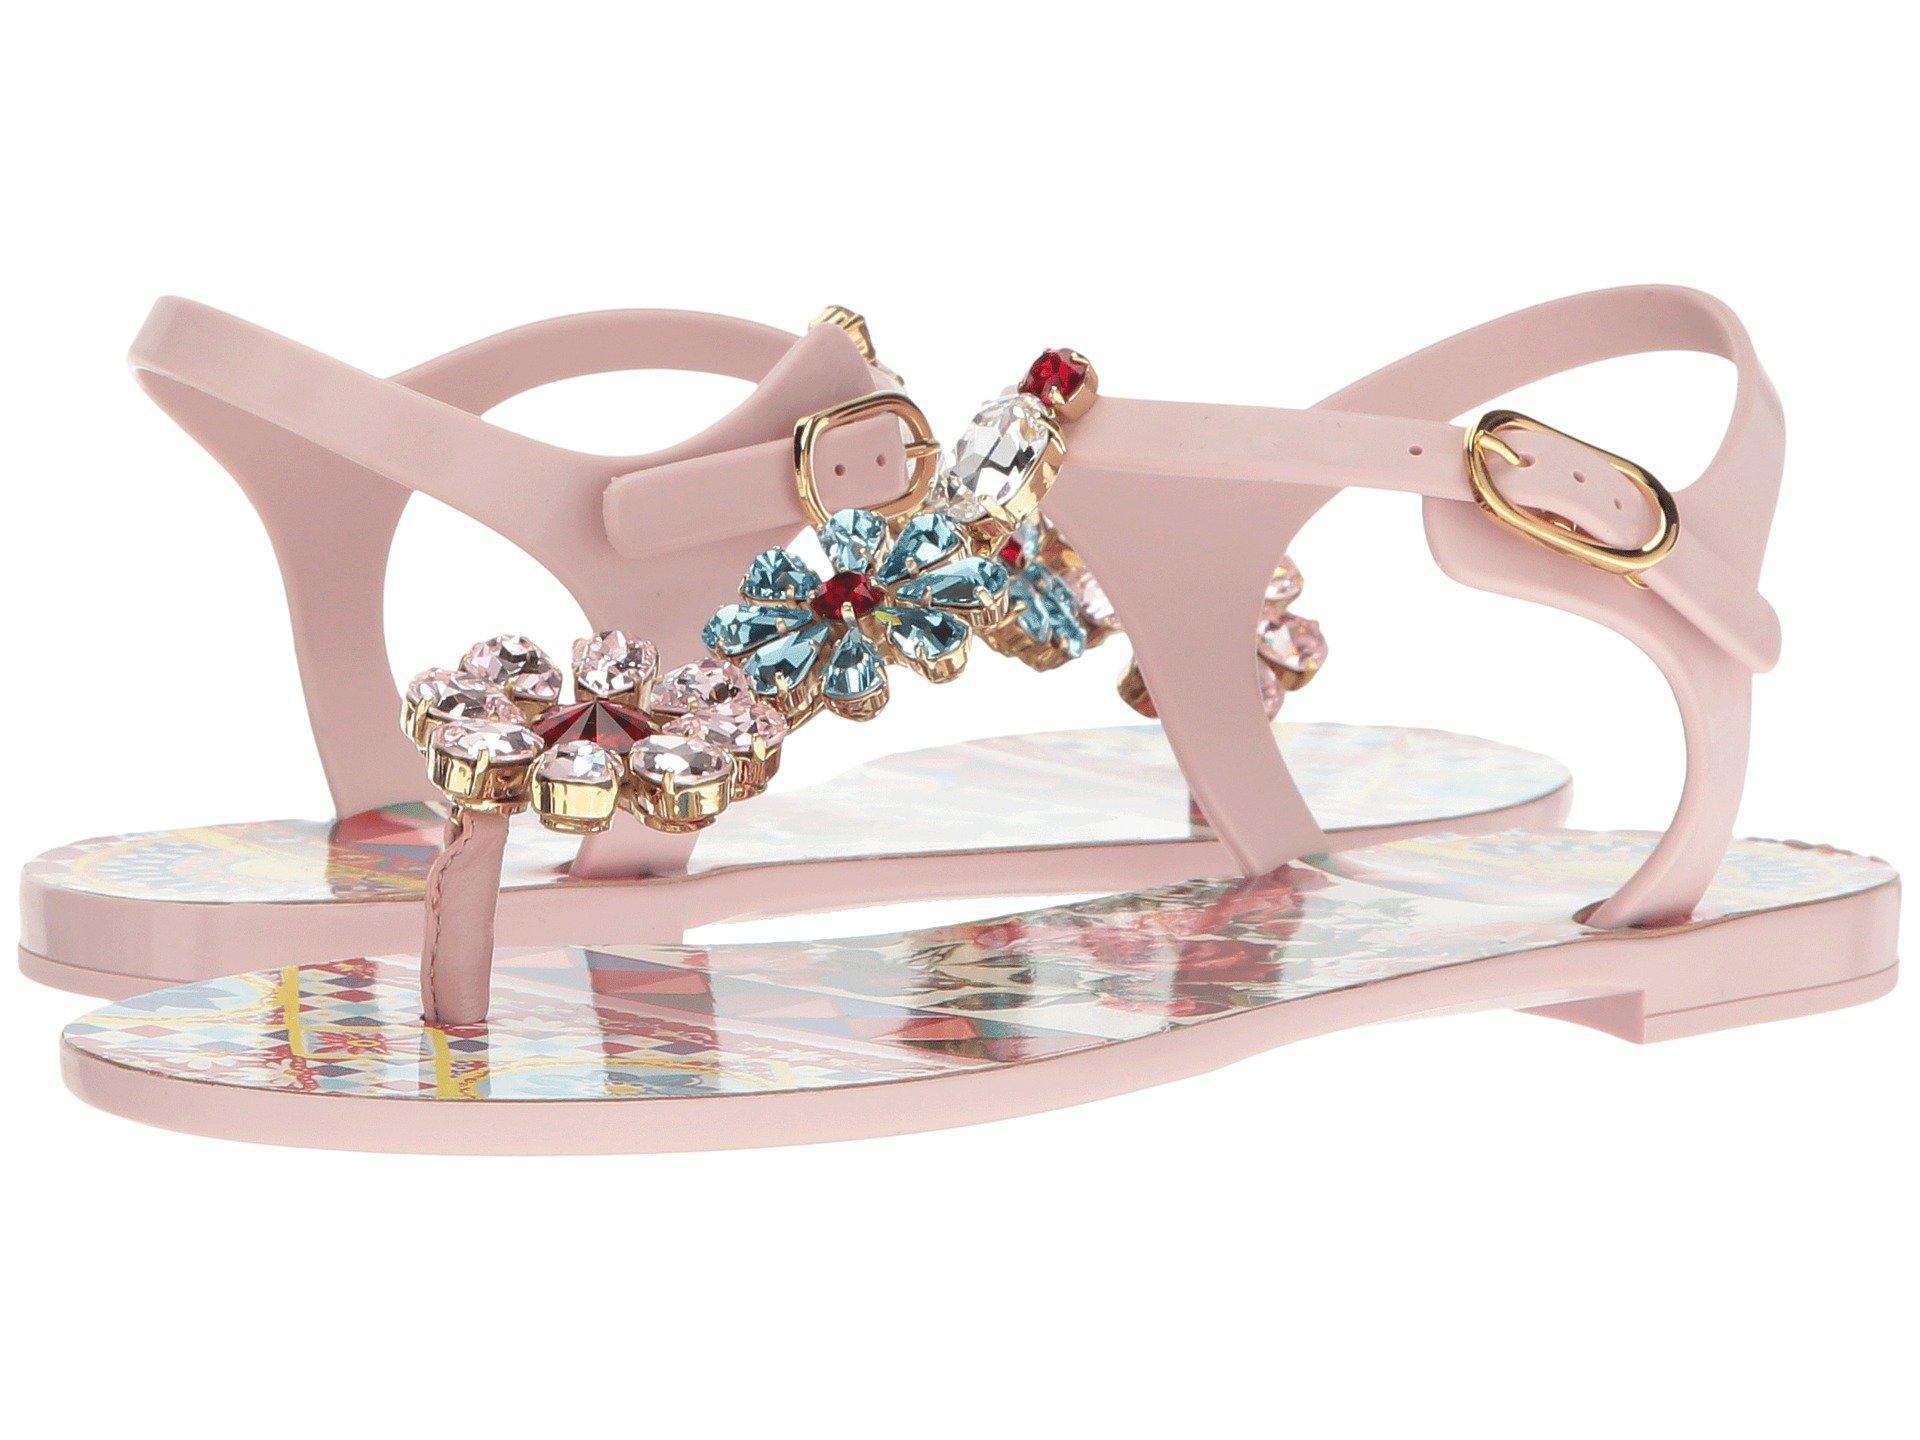 318231845c40 Lyst - Dolce   Gabbana Carretto Jelly Sandal With Swarovski Crystals ...